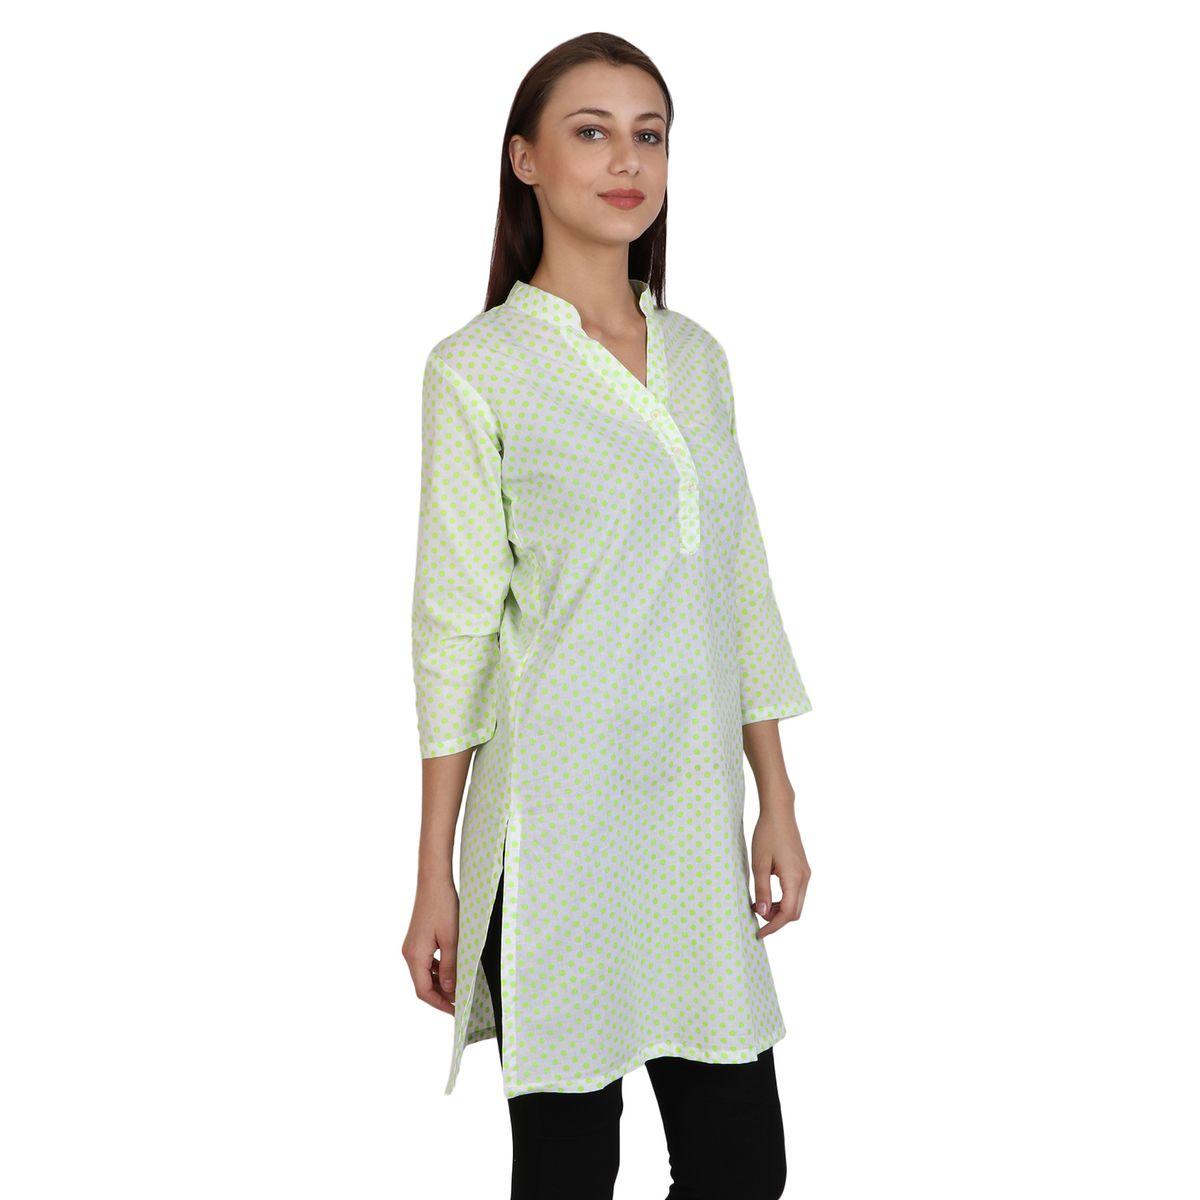 Sat Garments Solid kurtis RS-143 J